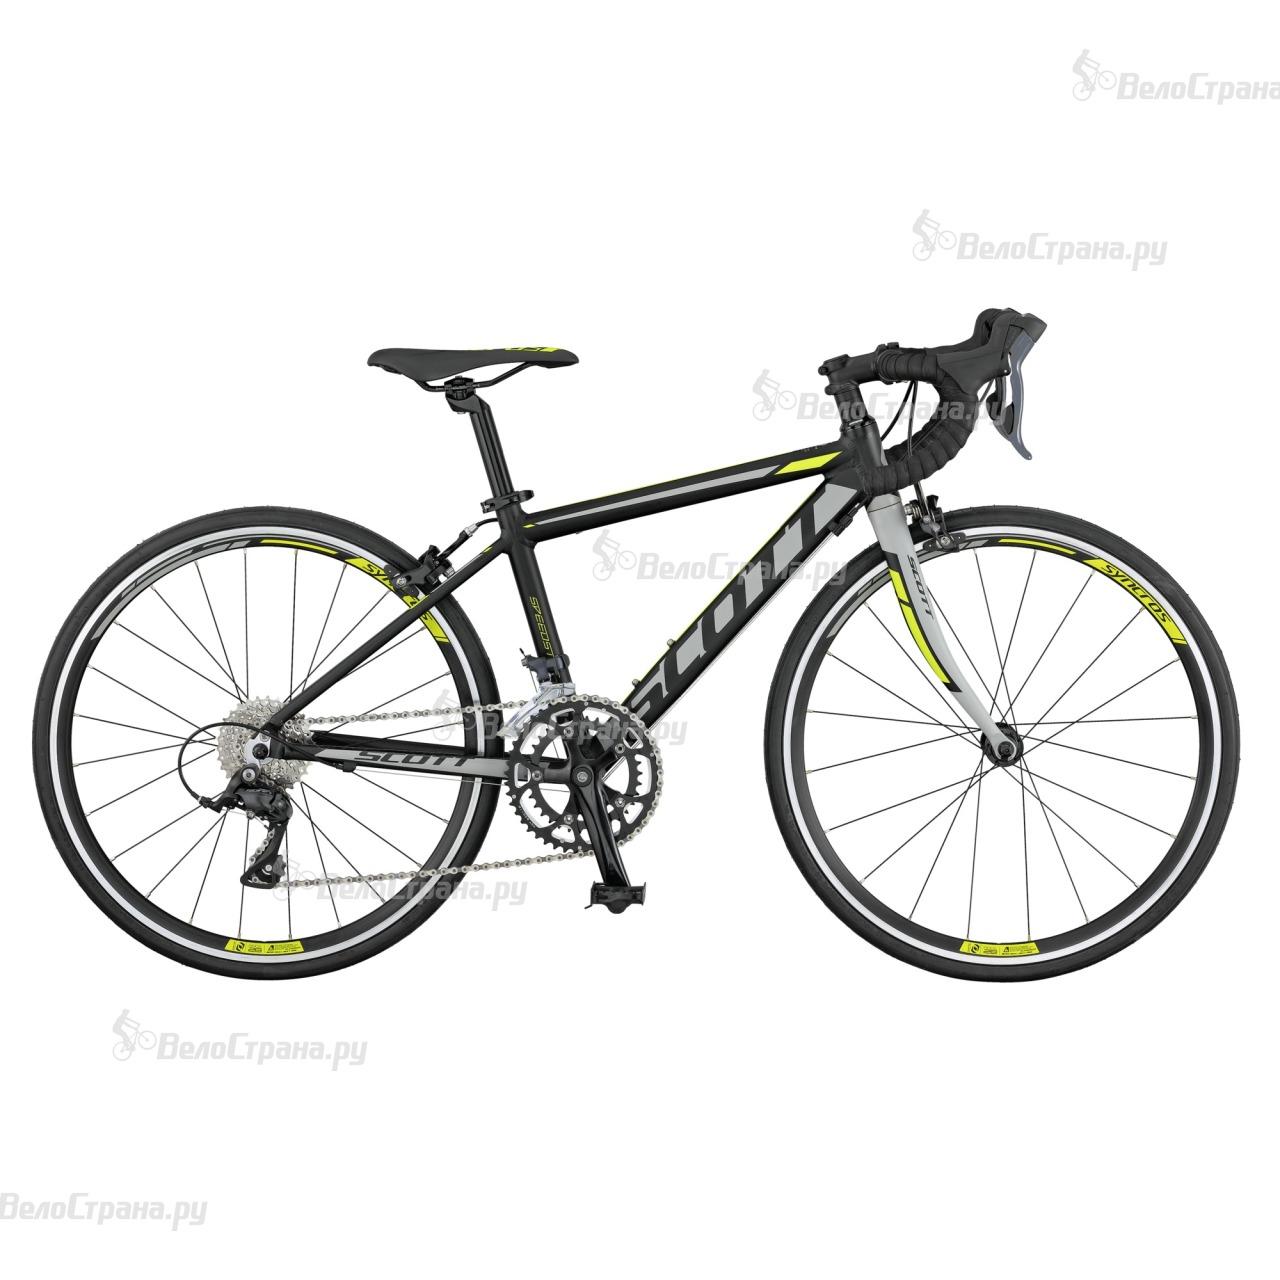 Велосипед Scott Speedster JR 24 (2017)